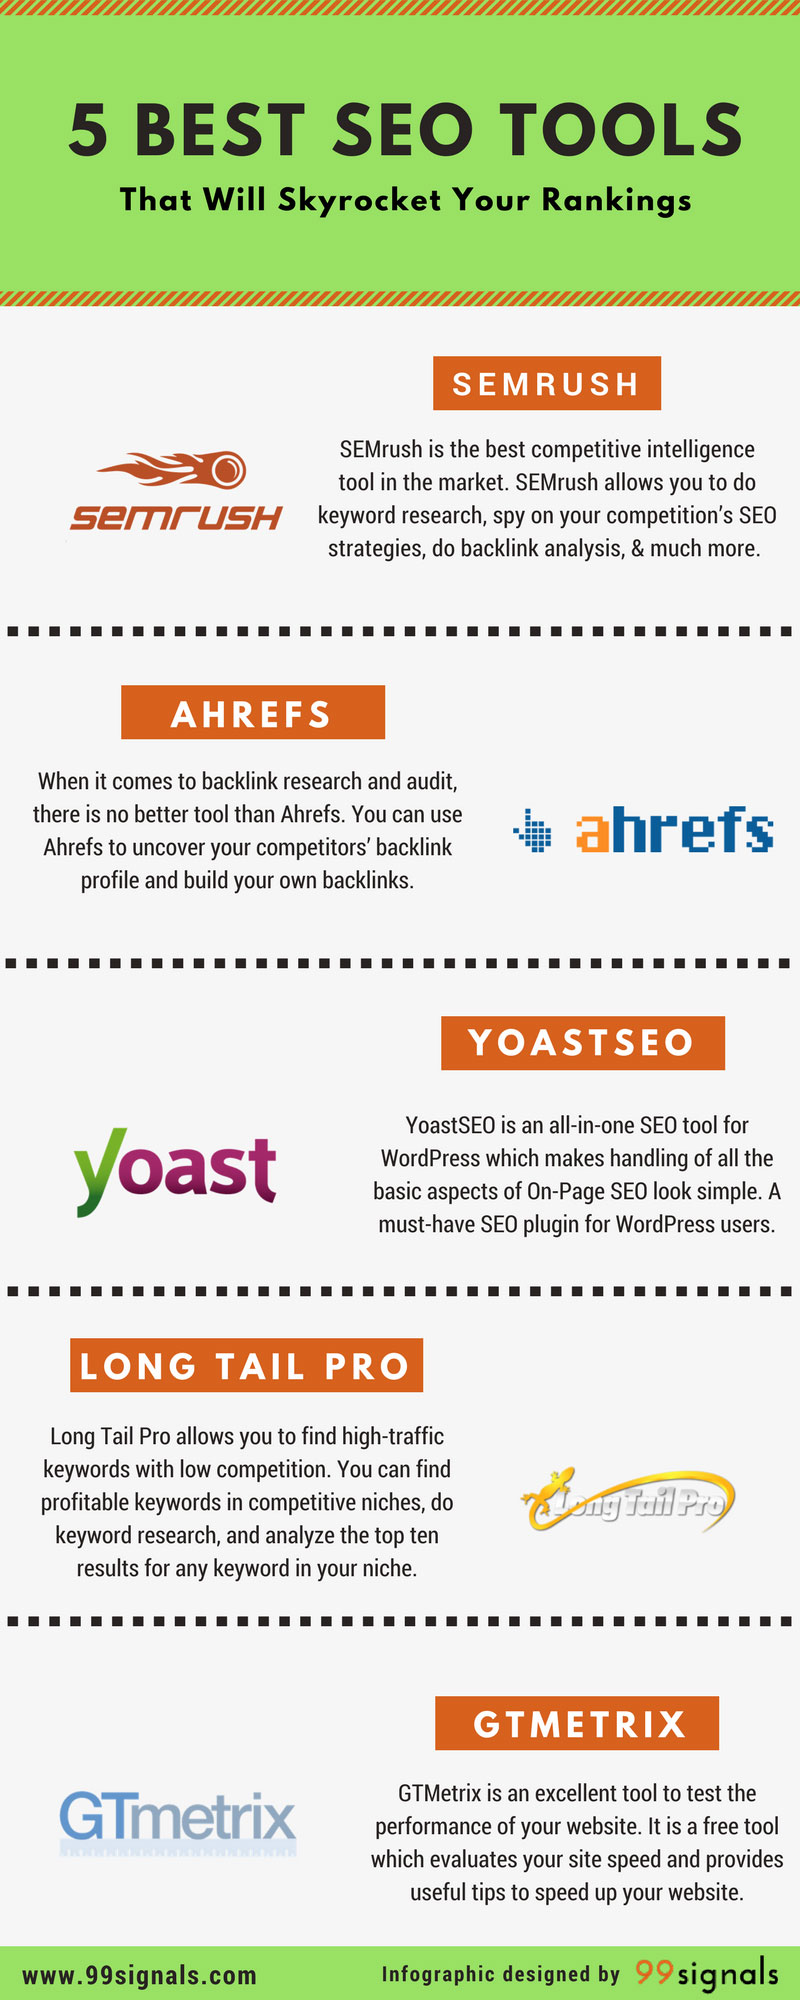 best seo tools rankings infographic